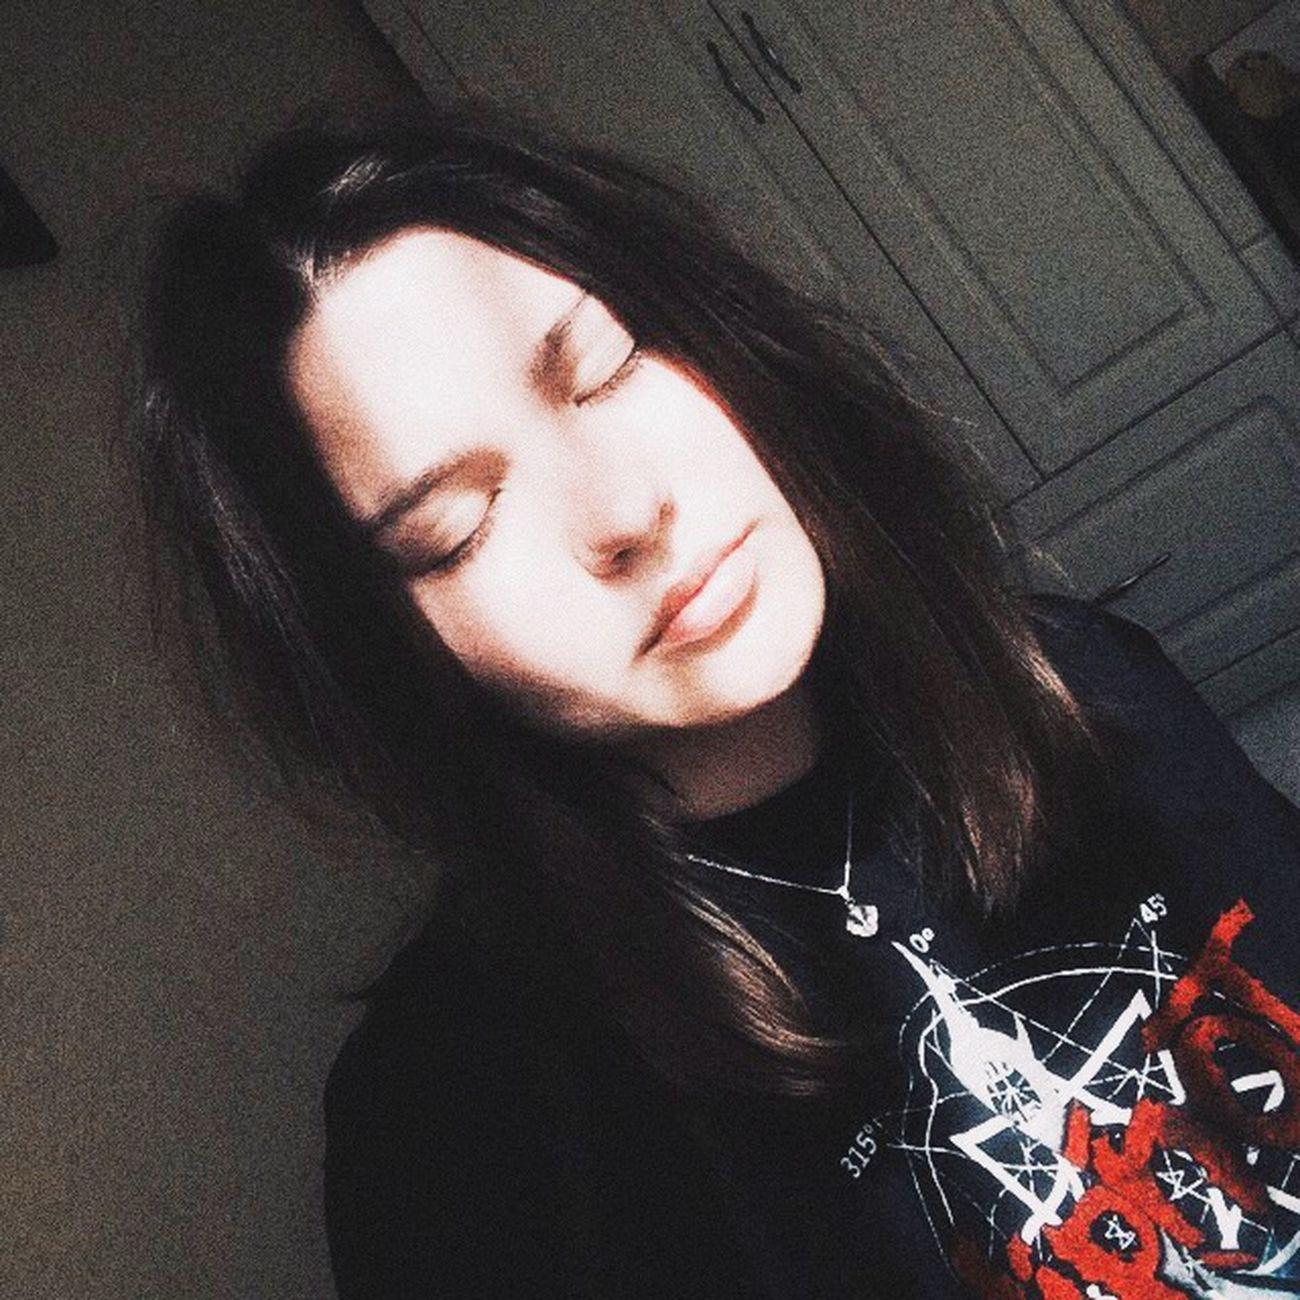 Vsco #vscocam #vscolike #vscostyle #bless #bugatti #backstage #aviary #ootd #pauw #place #plants #fence #follow #fashion #followme #follow4follow #københavn #aviary #denmark #backstage #Metallica #Venom #Slayer #Anthrax #Destruction